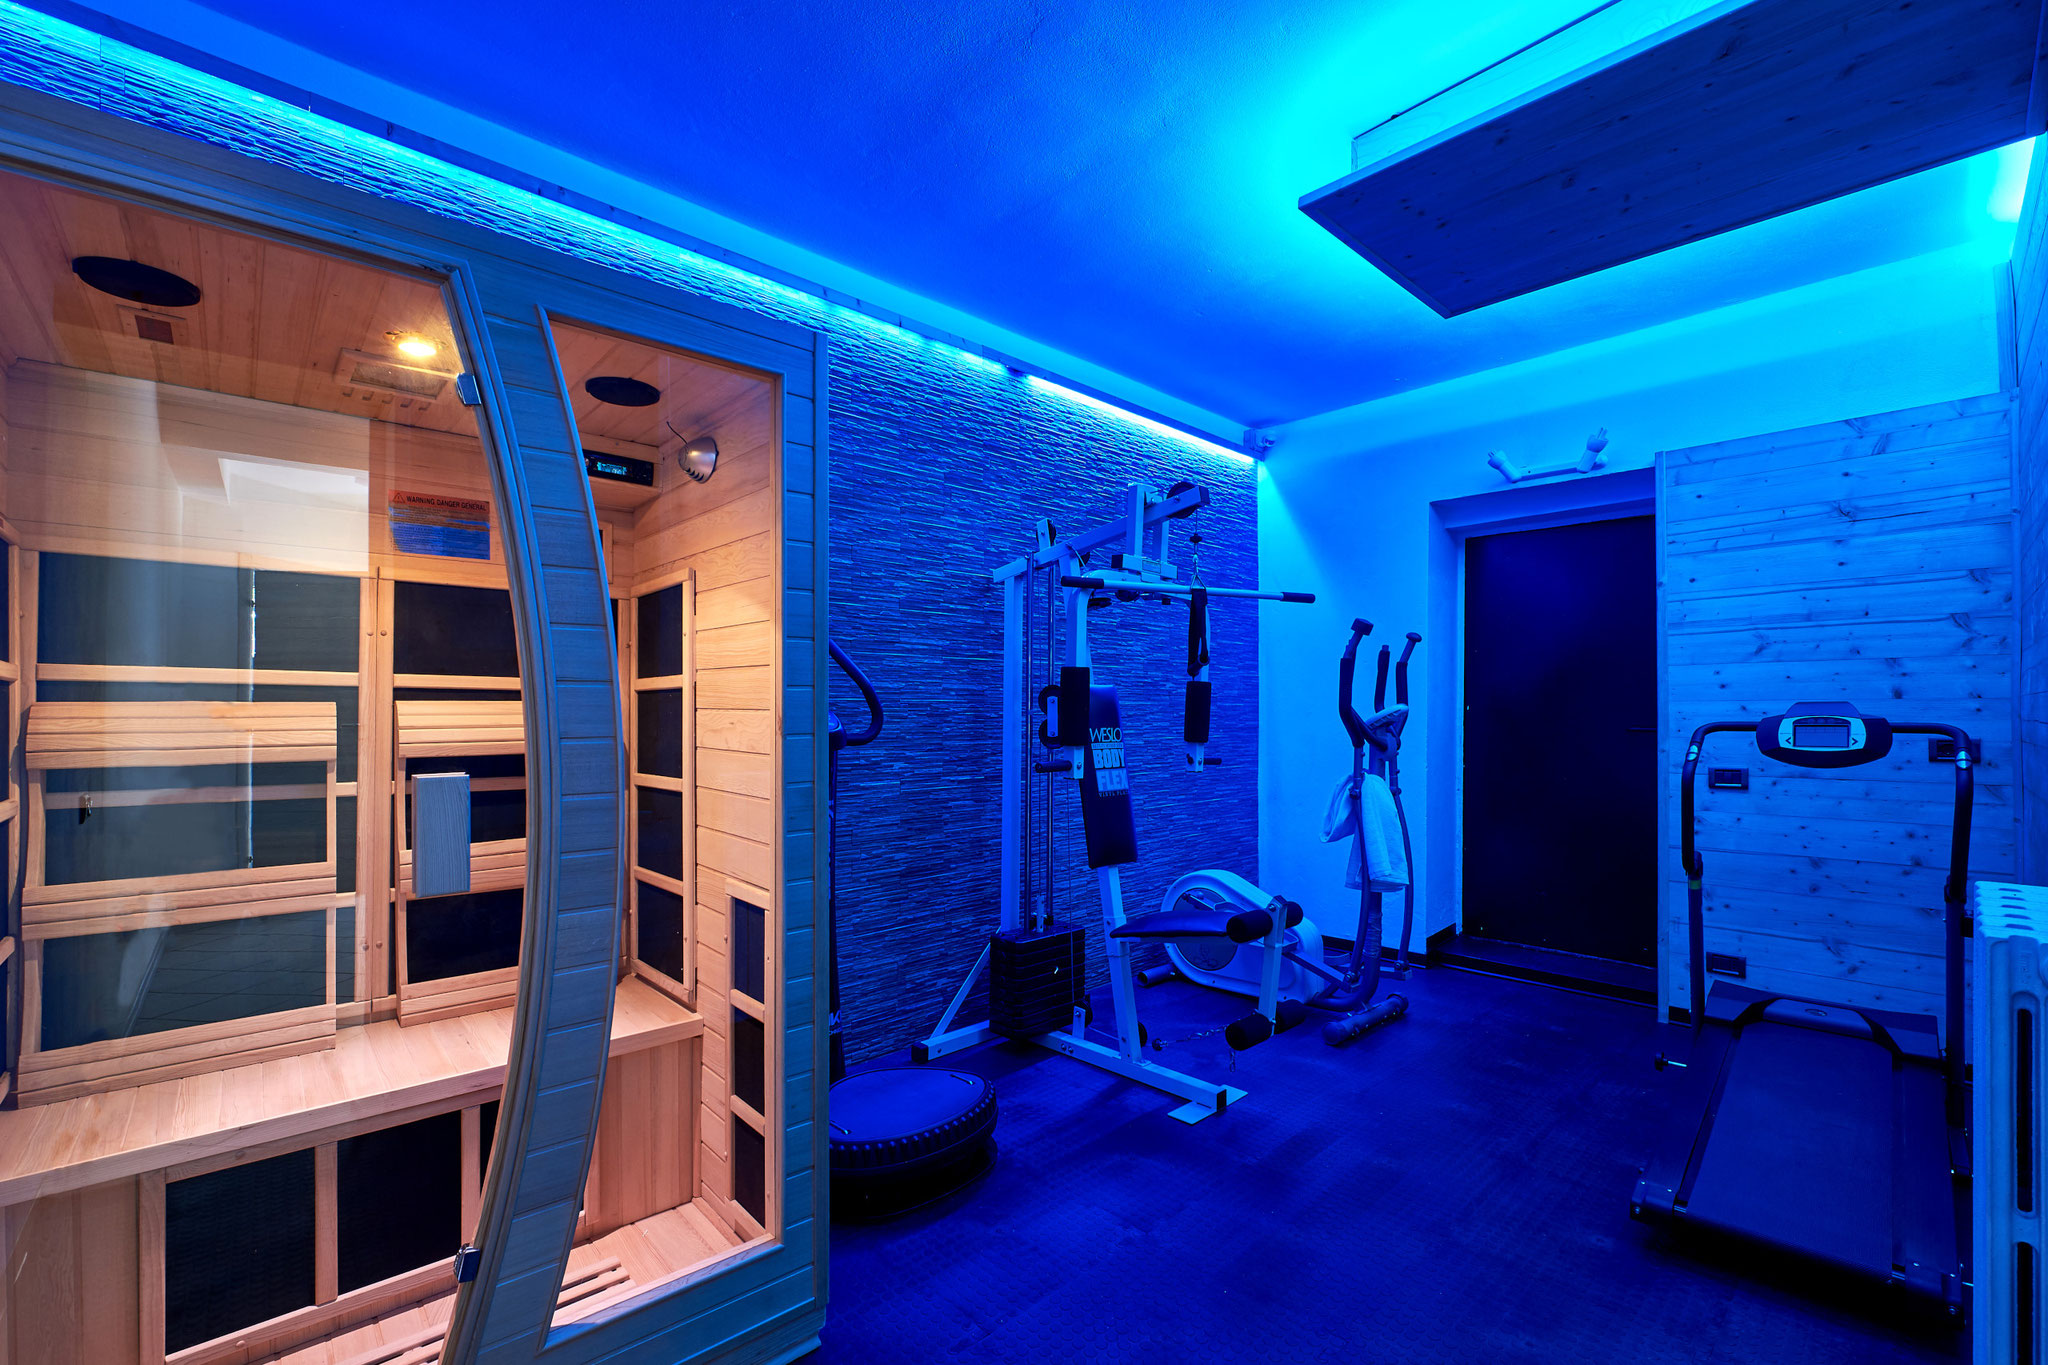 Casa San Giorgio Holiday House - Bedroom Holiday House AIR BNB Bed Breakfast Gym Fitness Spa